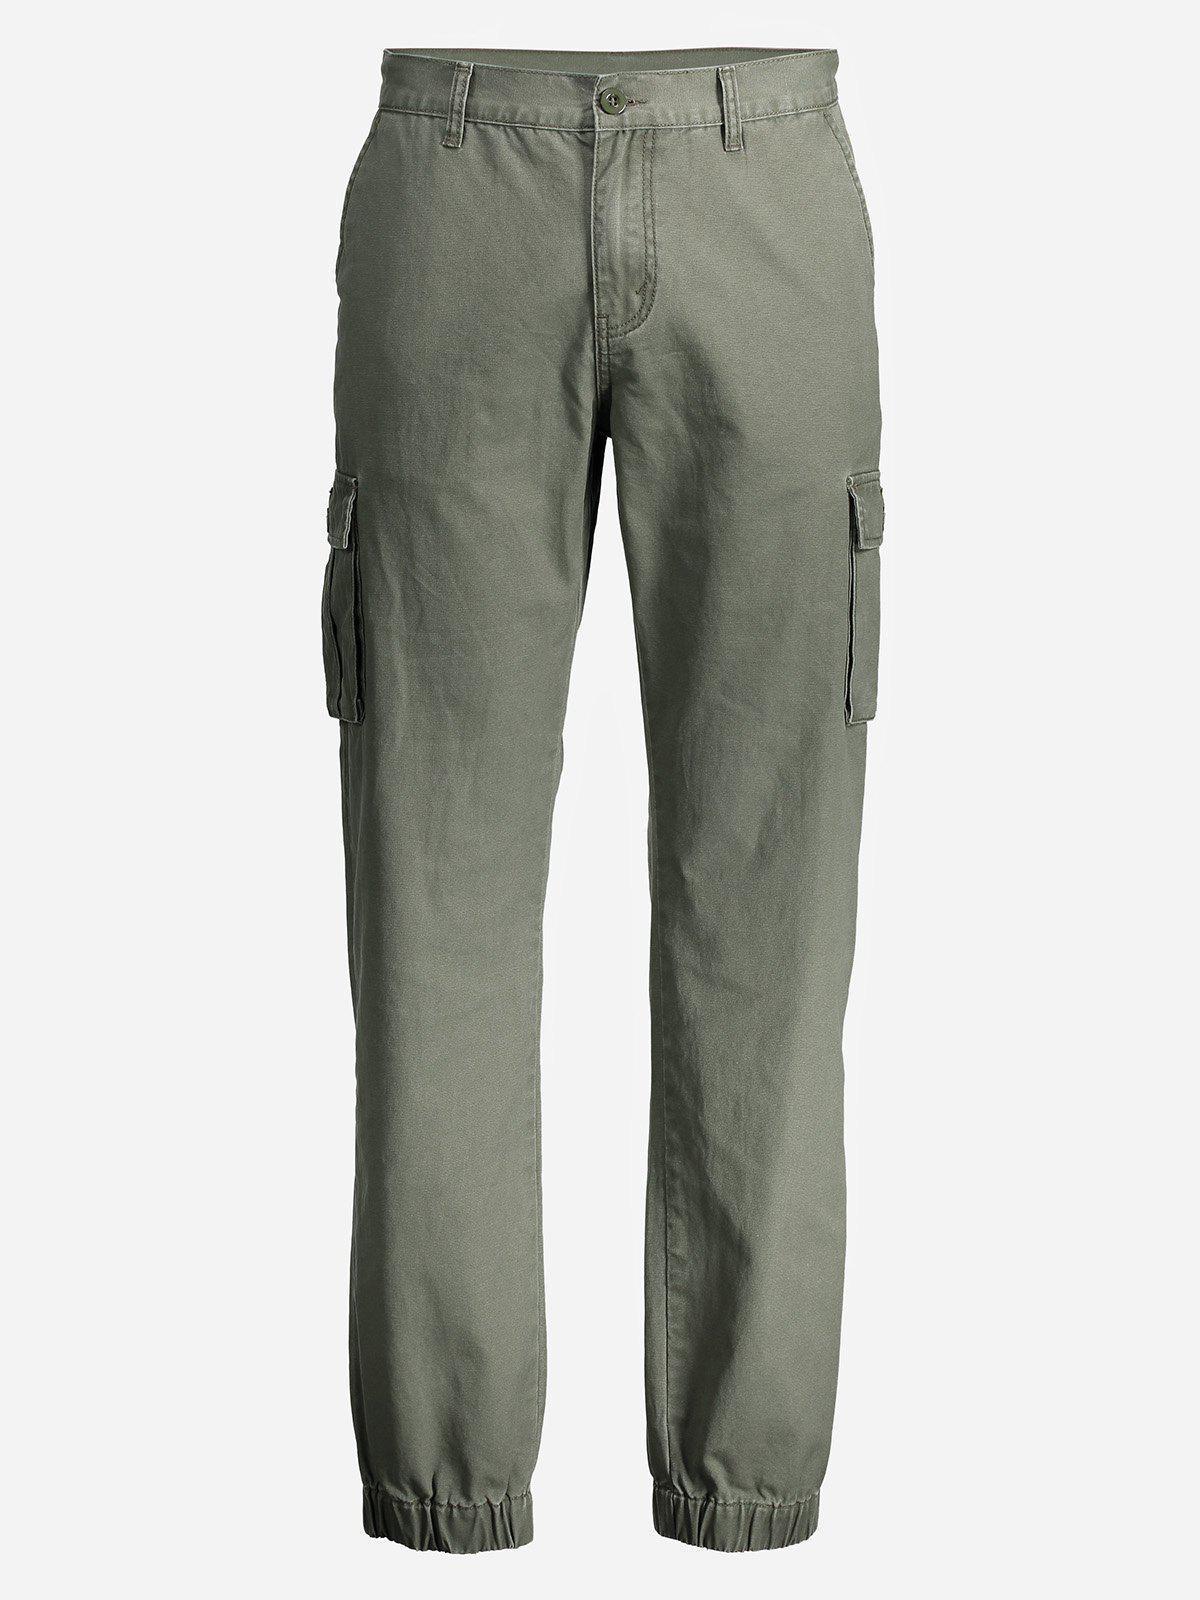 ZAN.STIL Männer Slim Cargo Pants